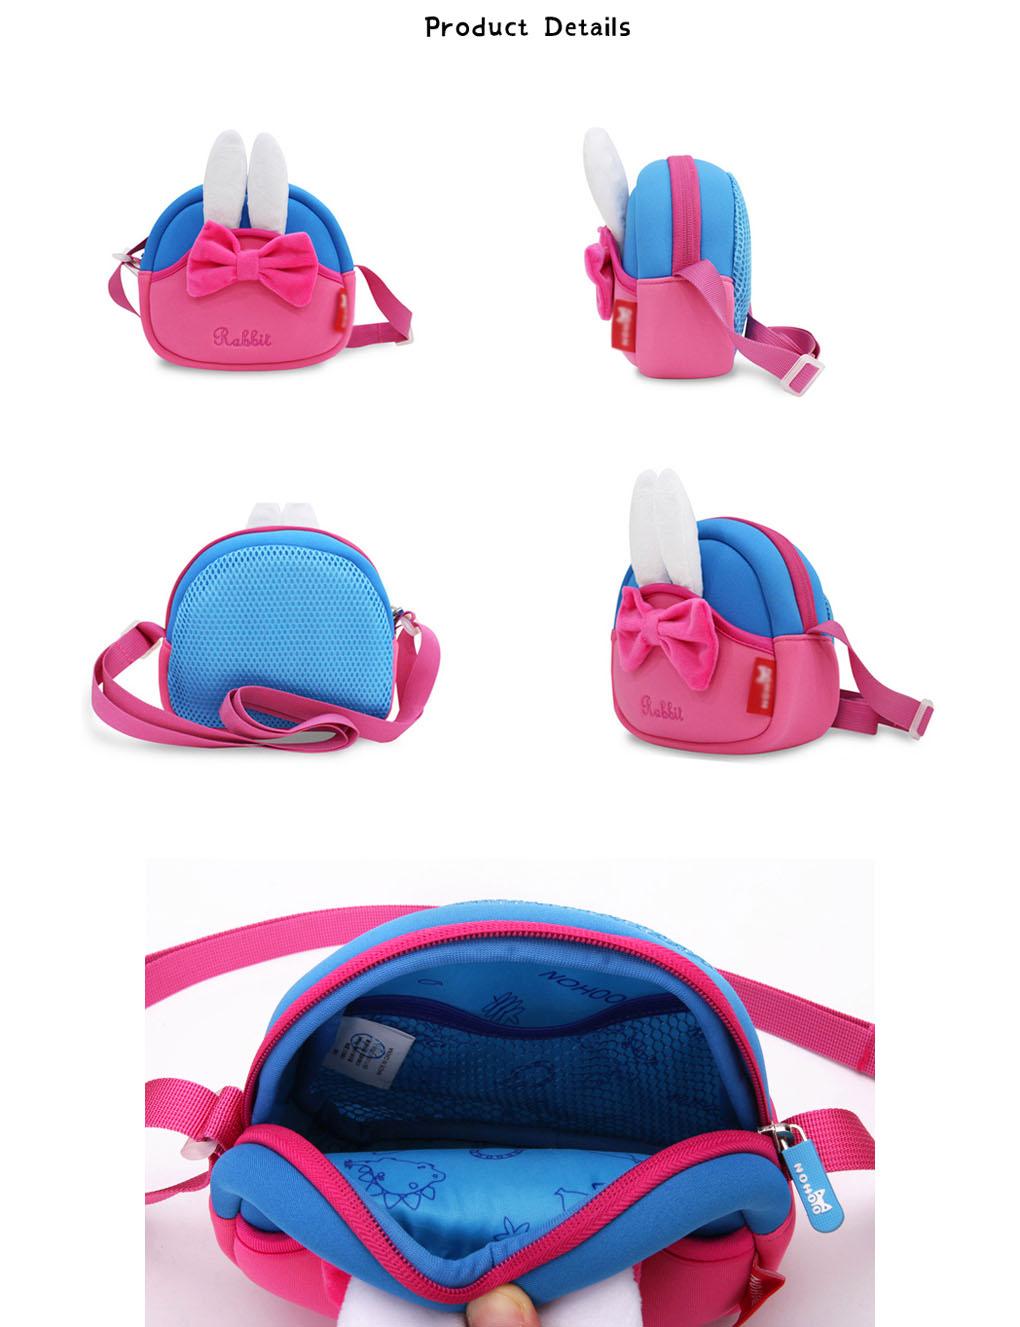 Nohoo Children Products-Neoprene Lightweight Eco-friendly Kids Messenger Bag For Little Girls